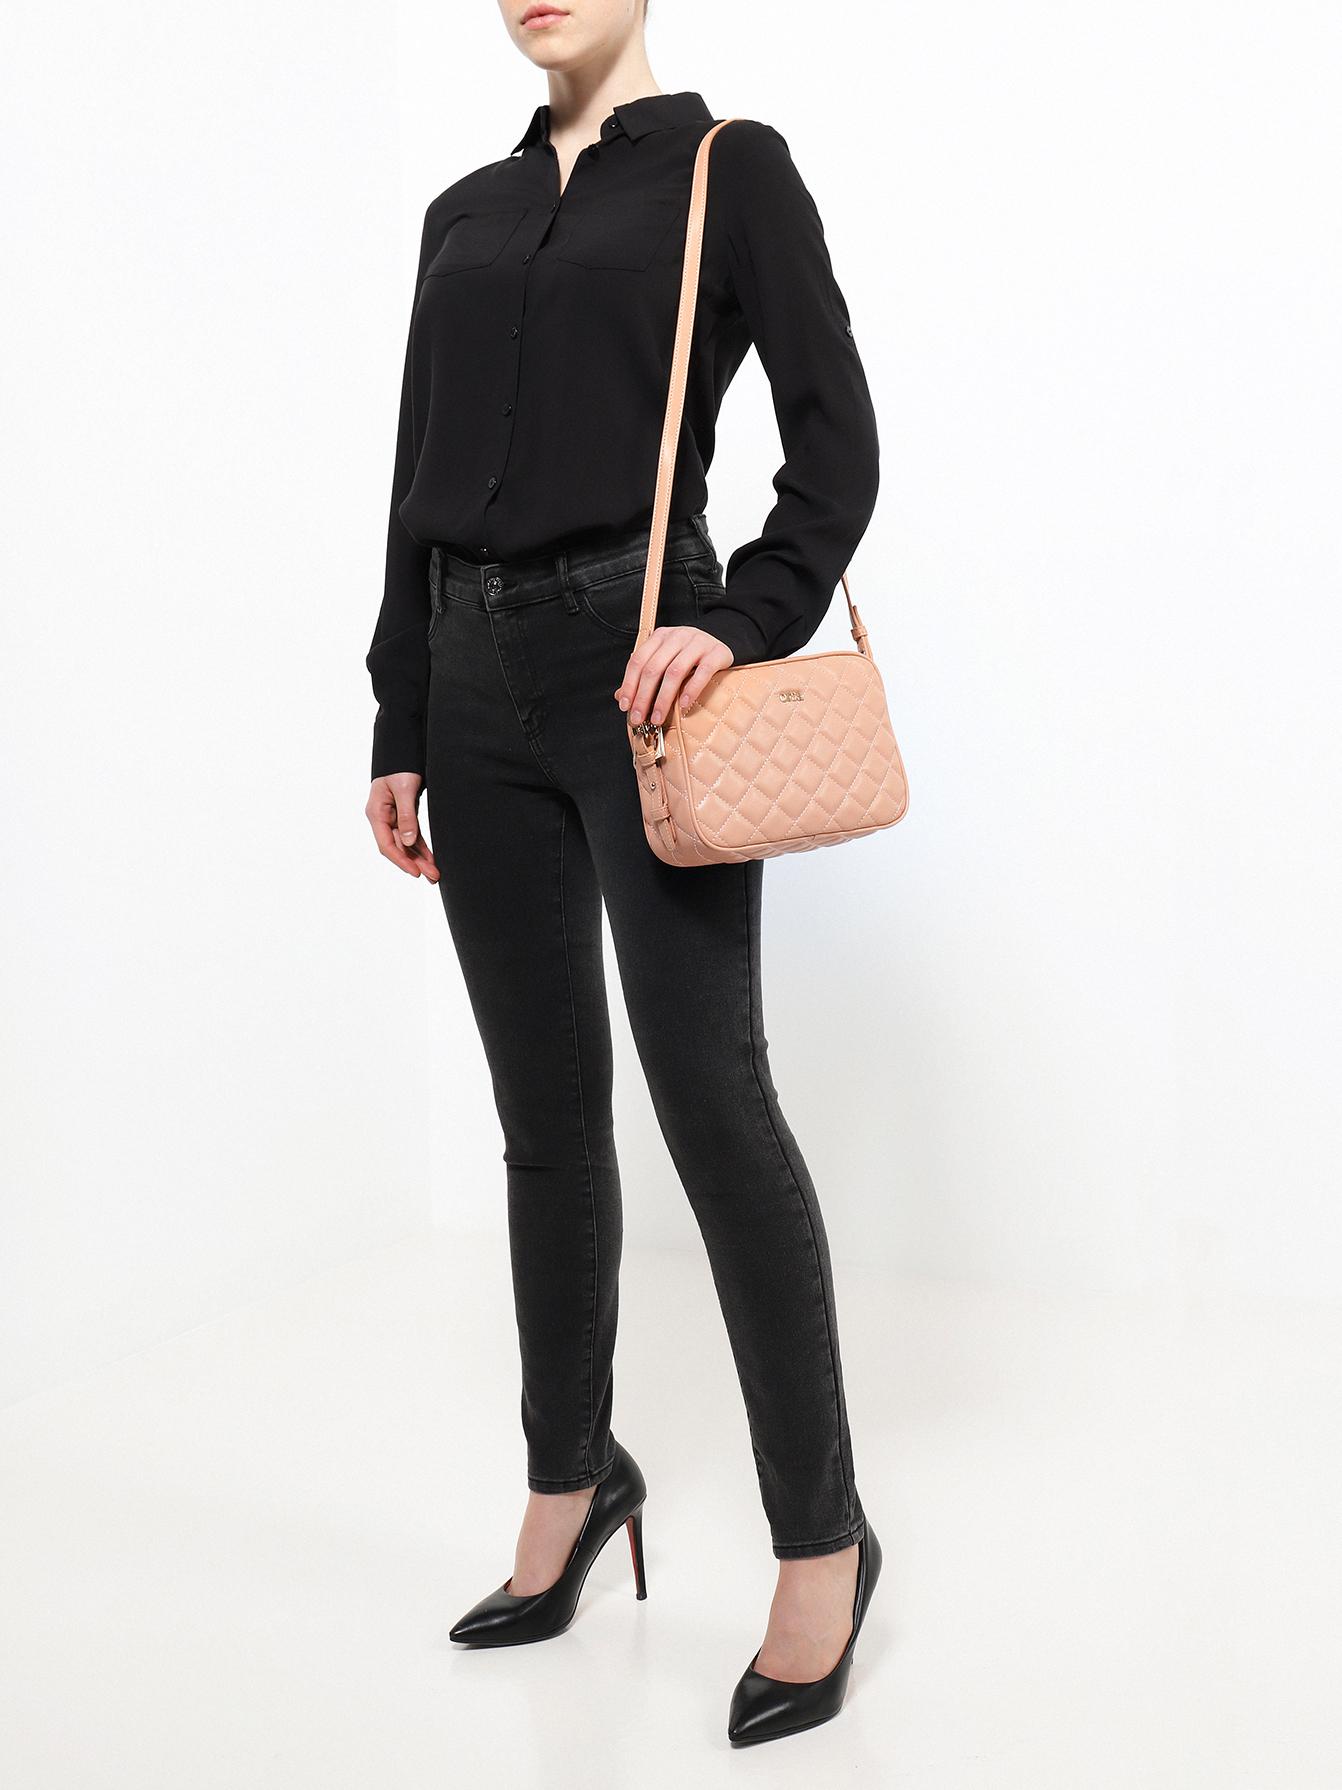 Сумка ORSA Сумка через плечо сумка через плечо new brand shippment price s9e canvas big bag